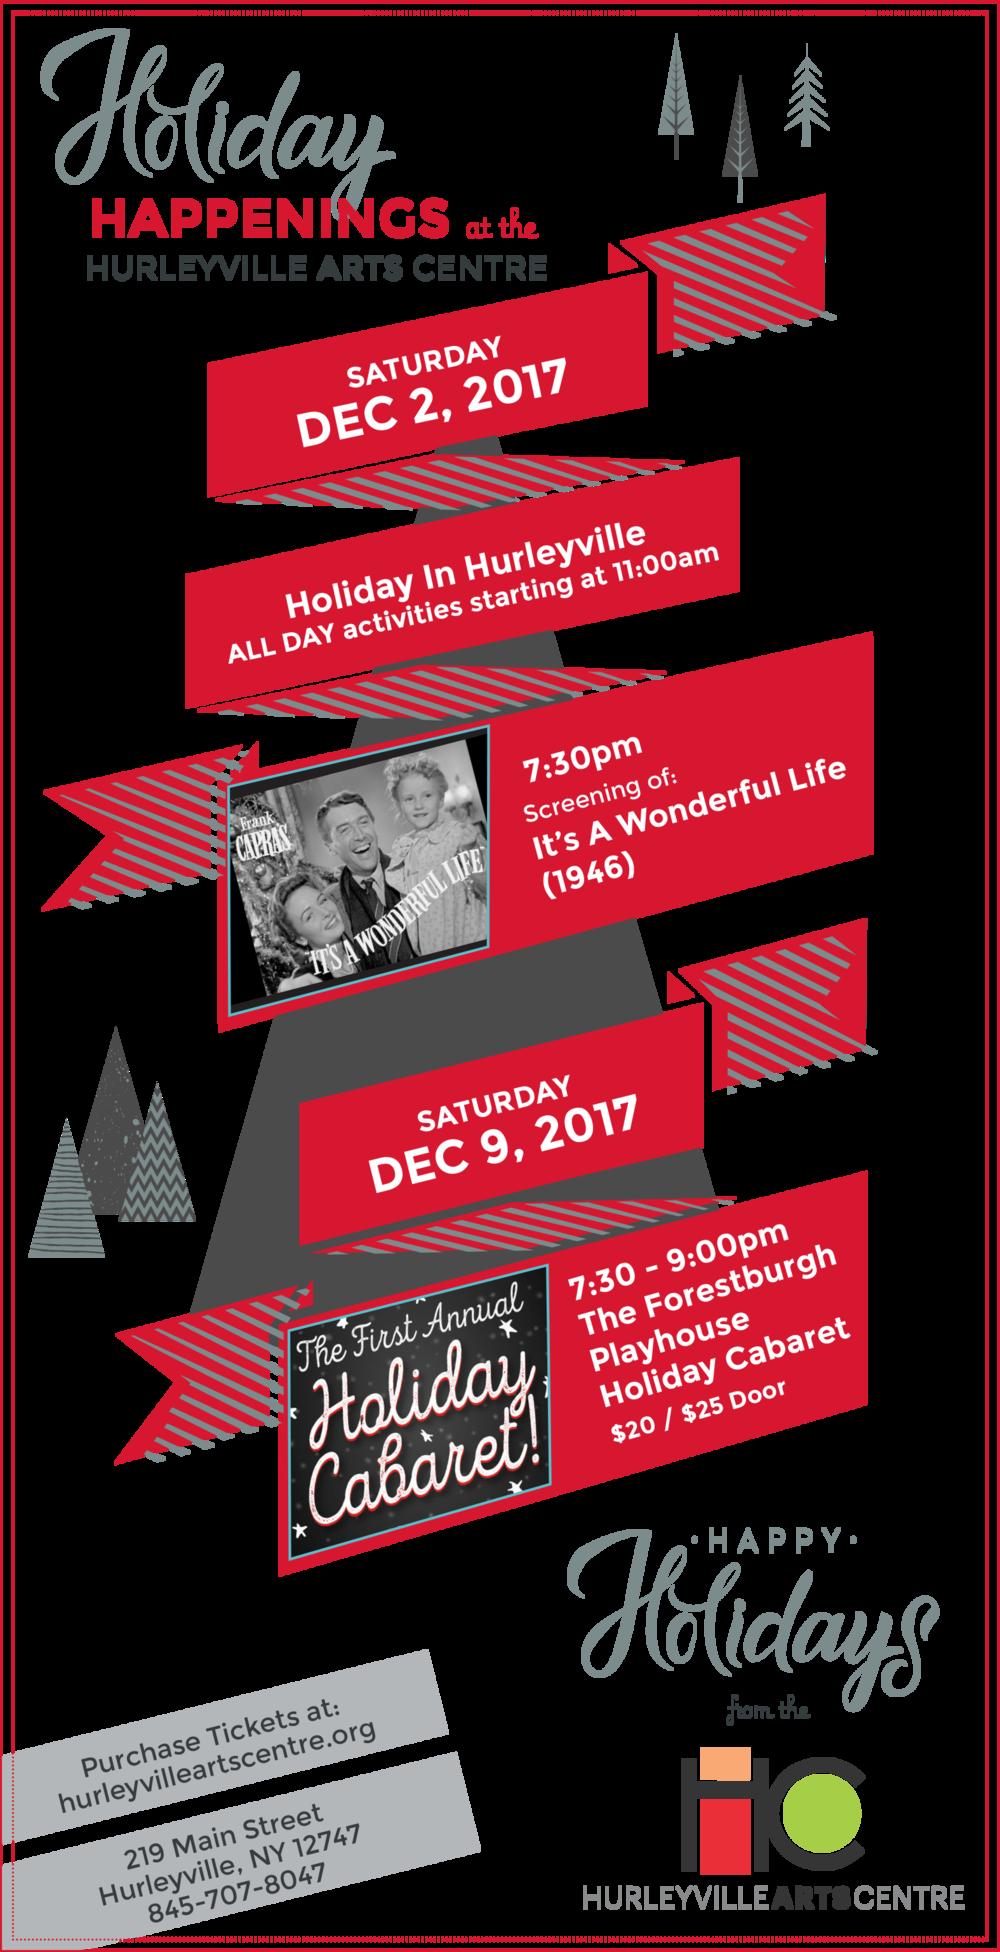 HAC-Democrat-Holiday-2017-v2.png